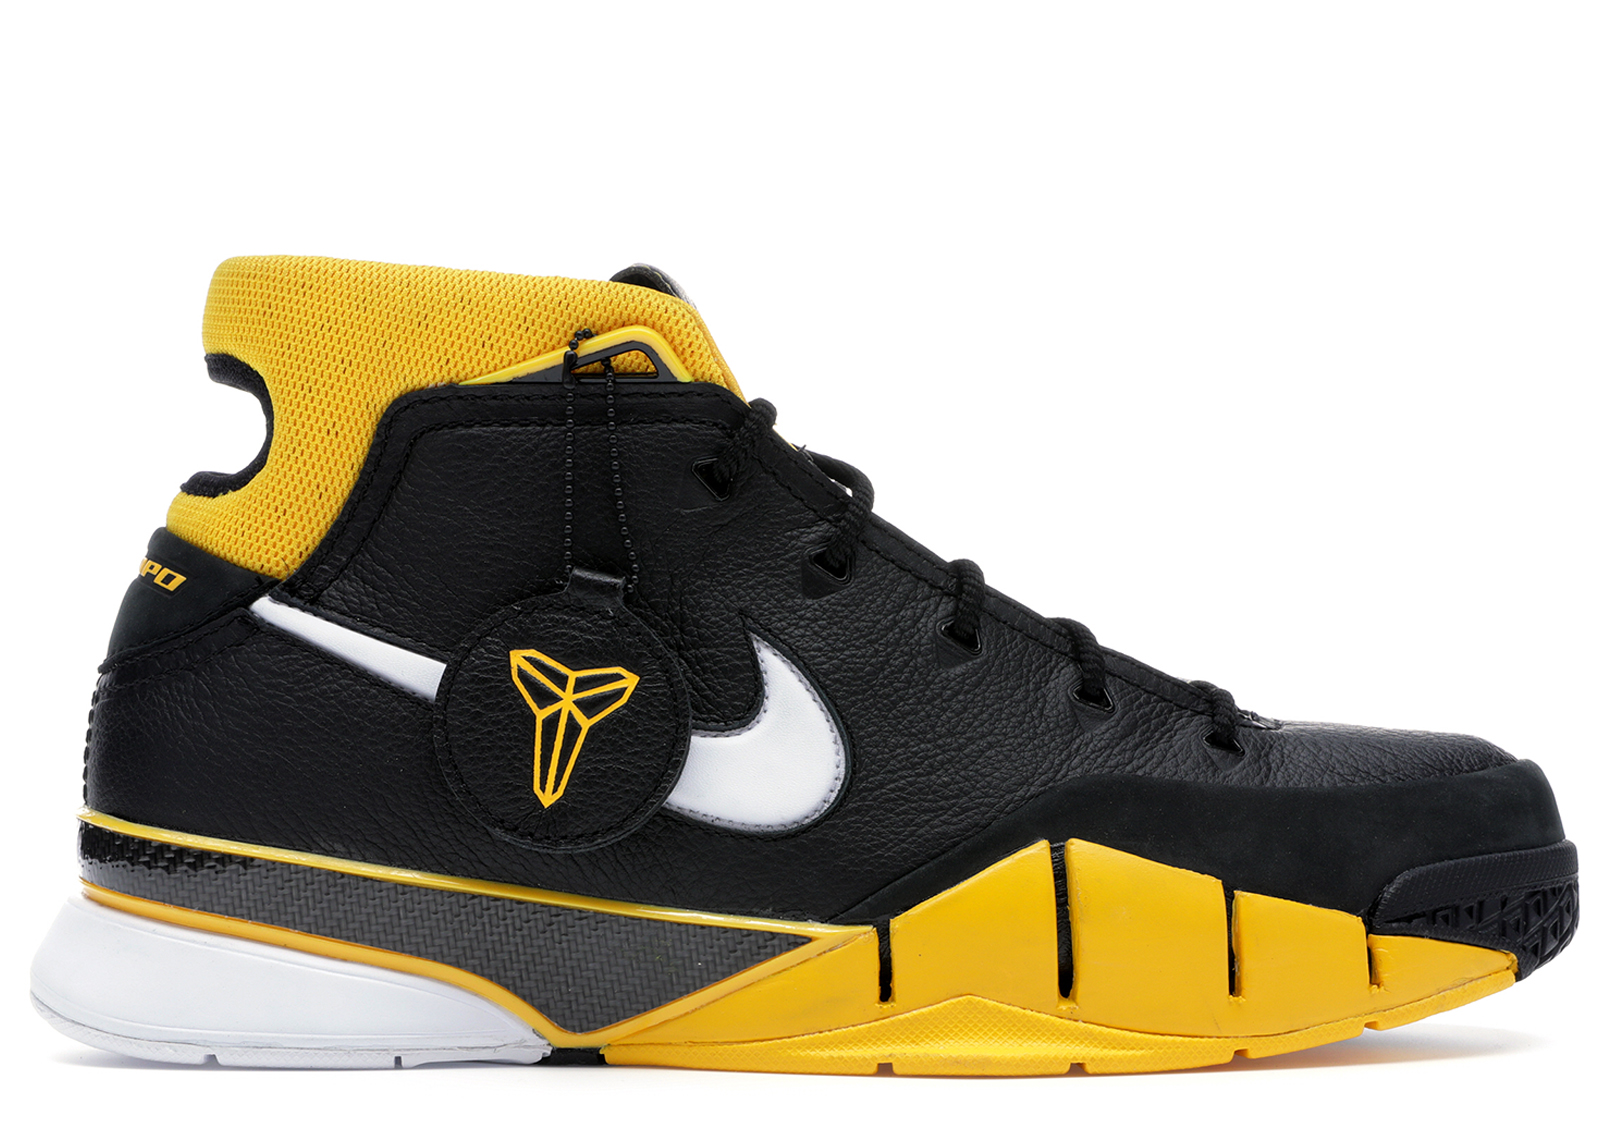 Nike Kobe 1 Protro Black Maize - AQ2728-003